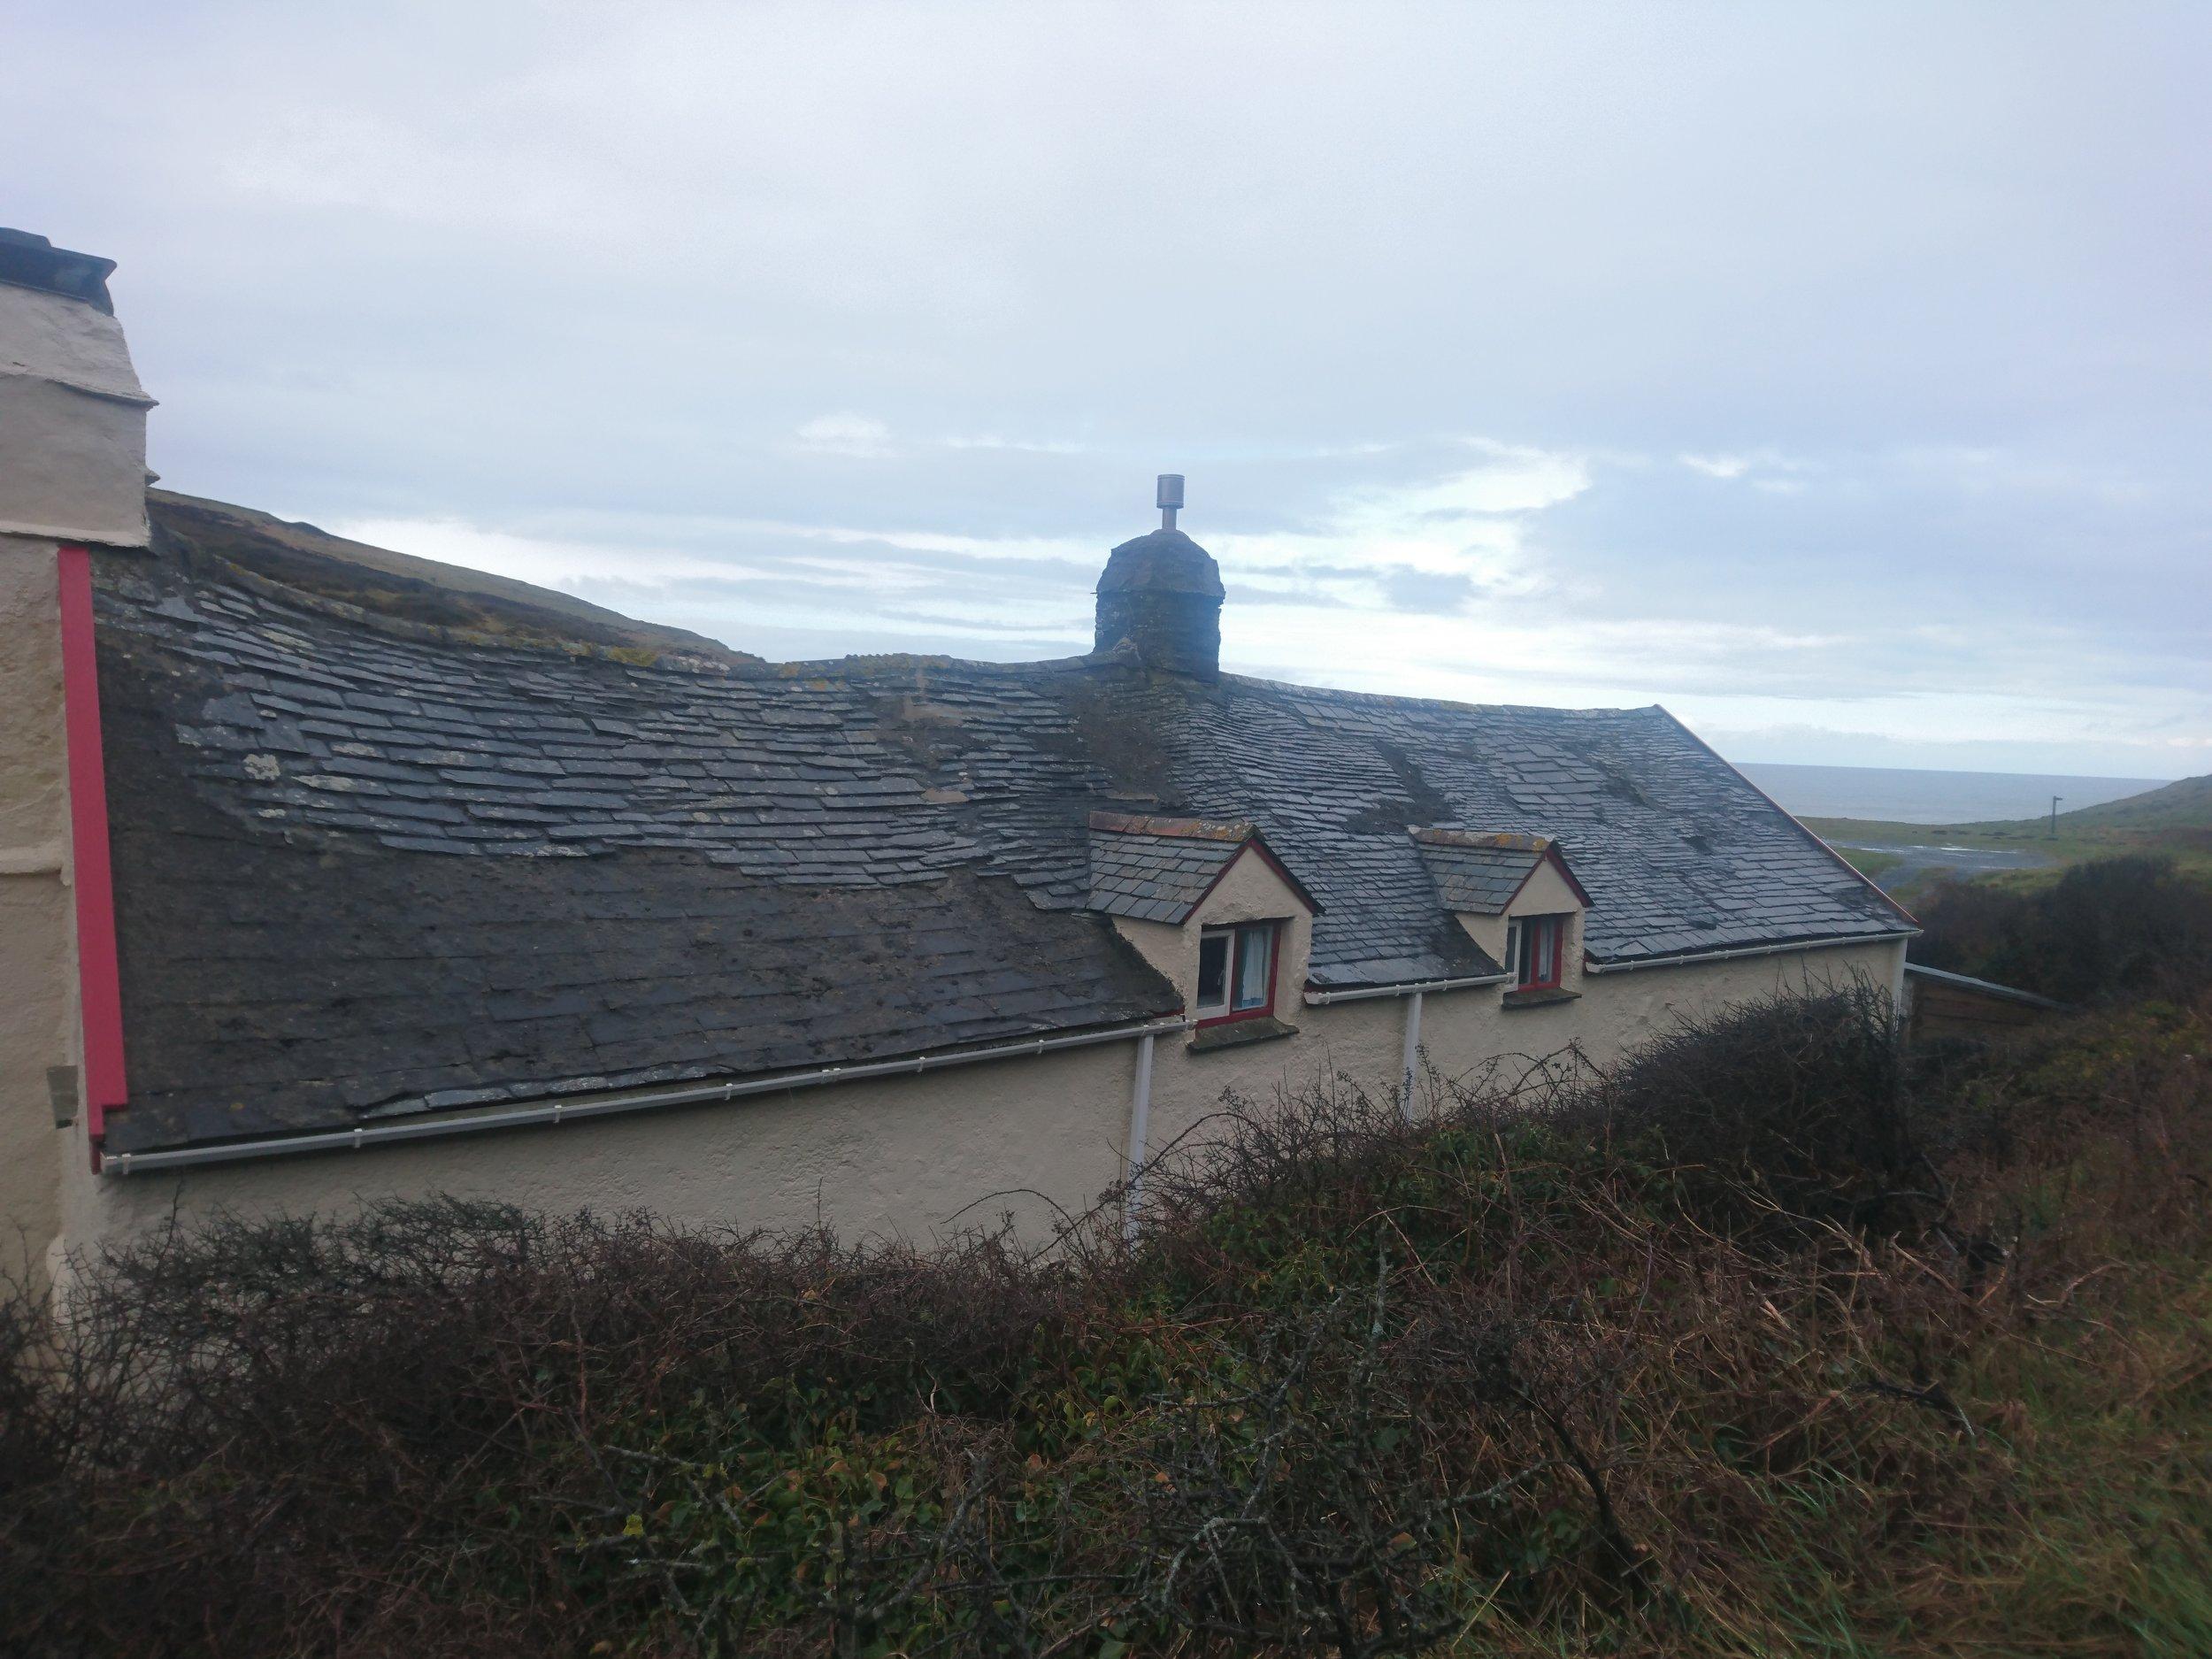 Rickety Roof